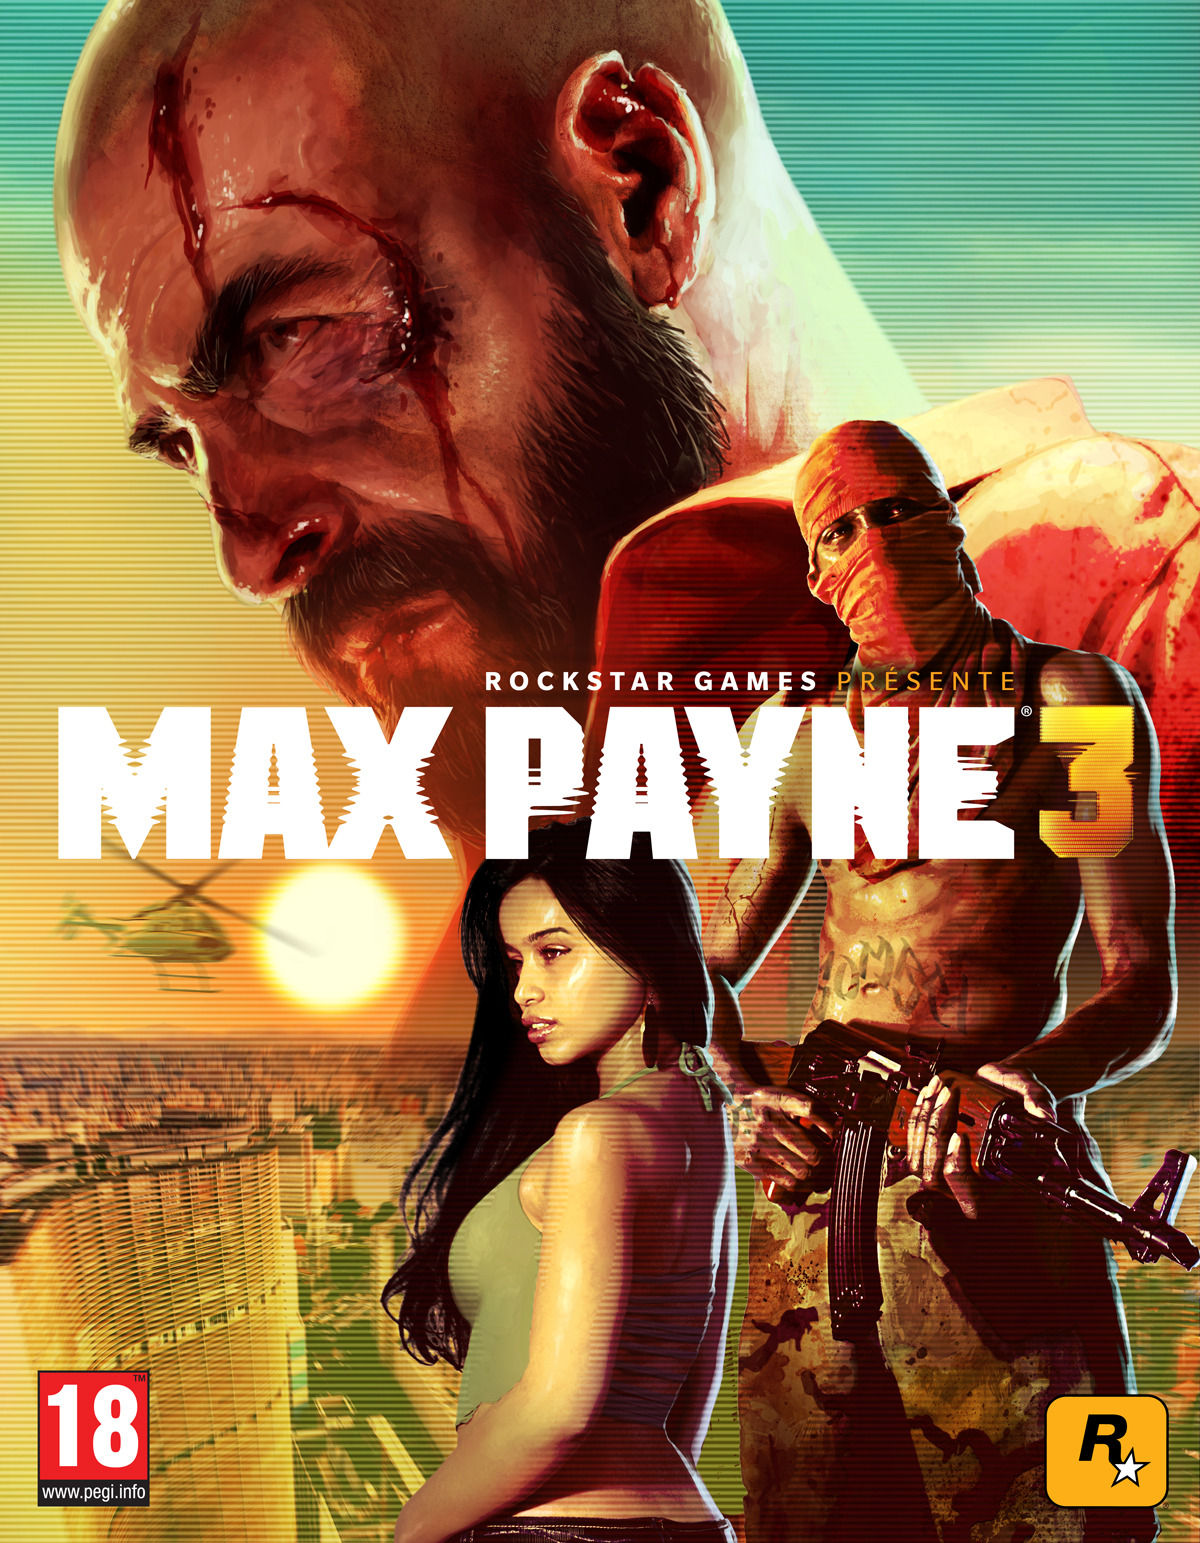 download crack max payne 3 windows 7